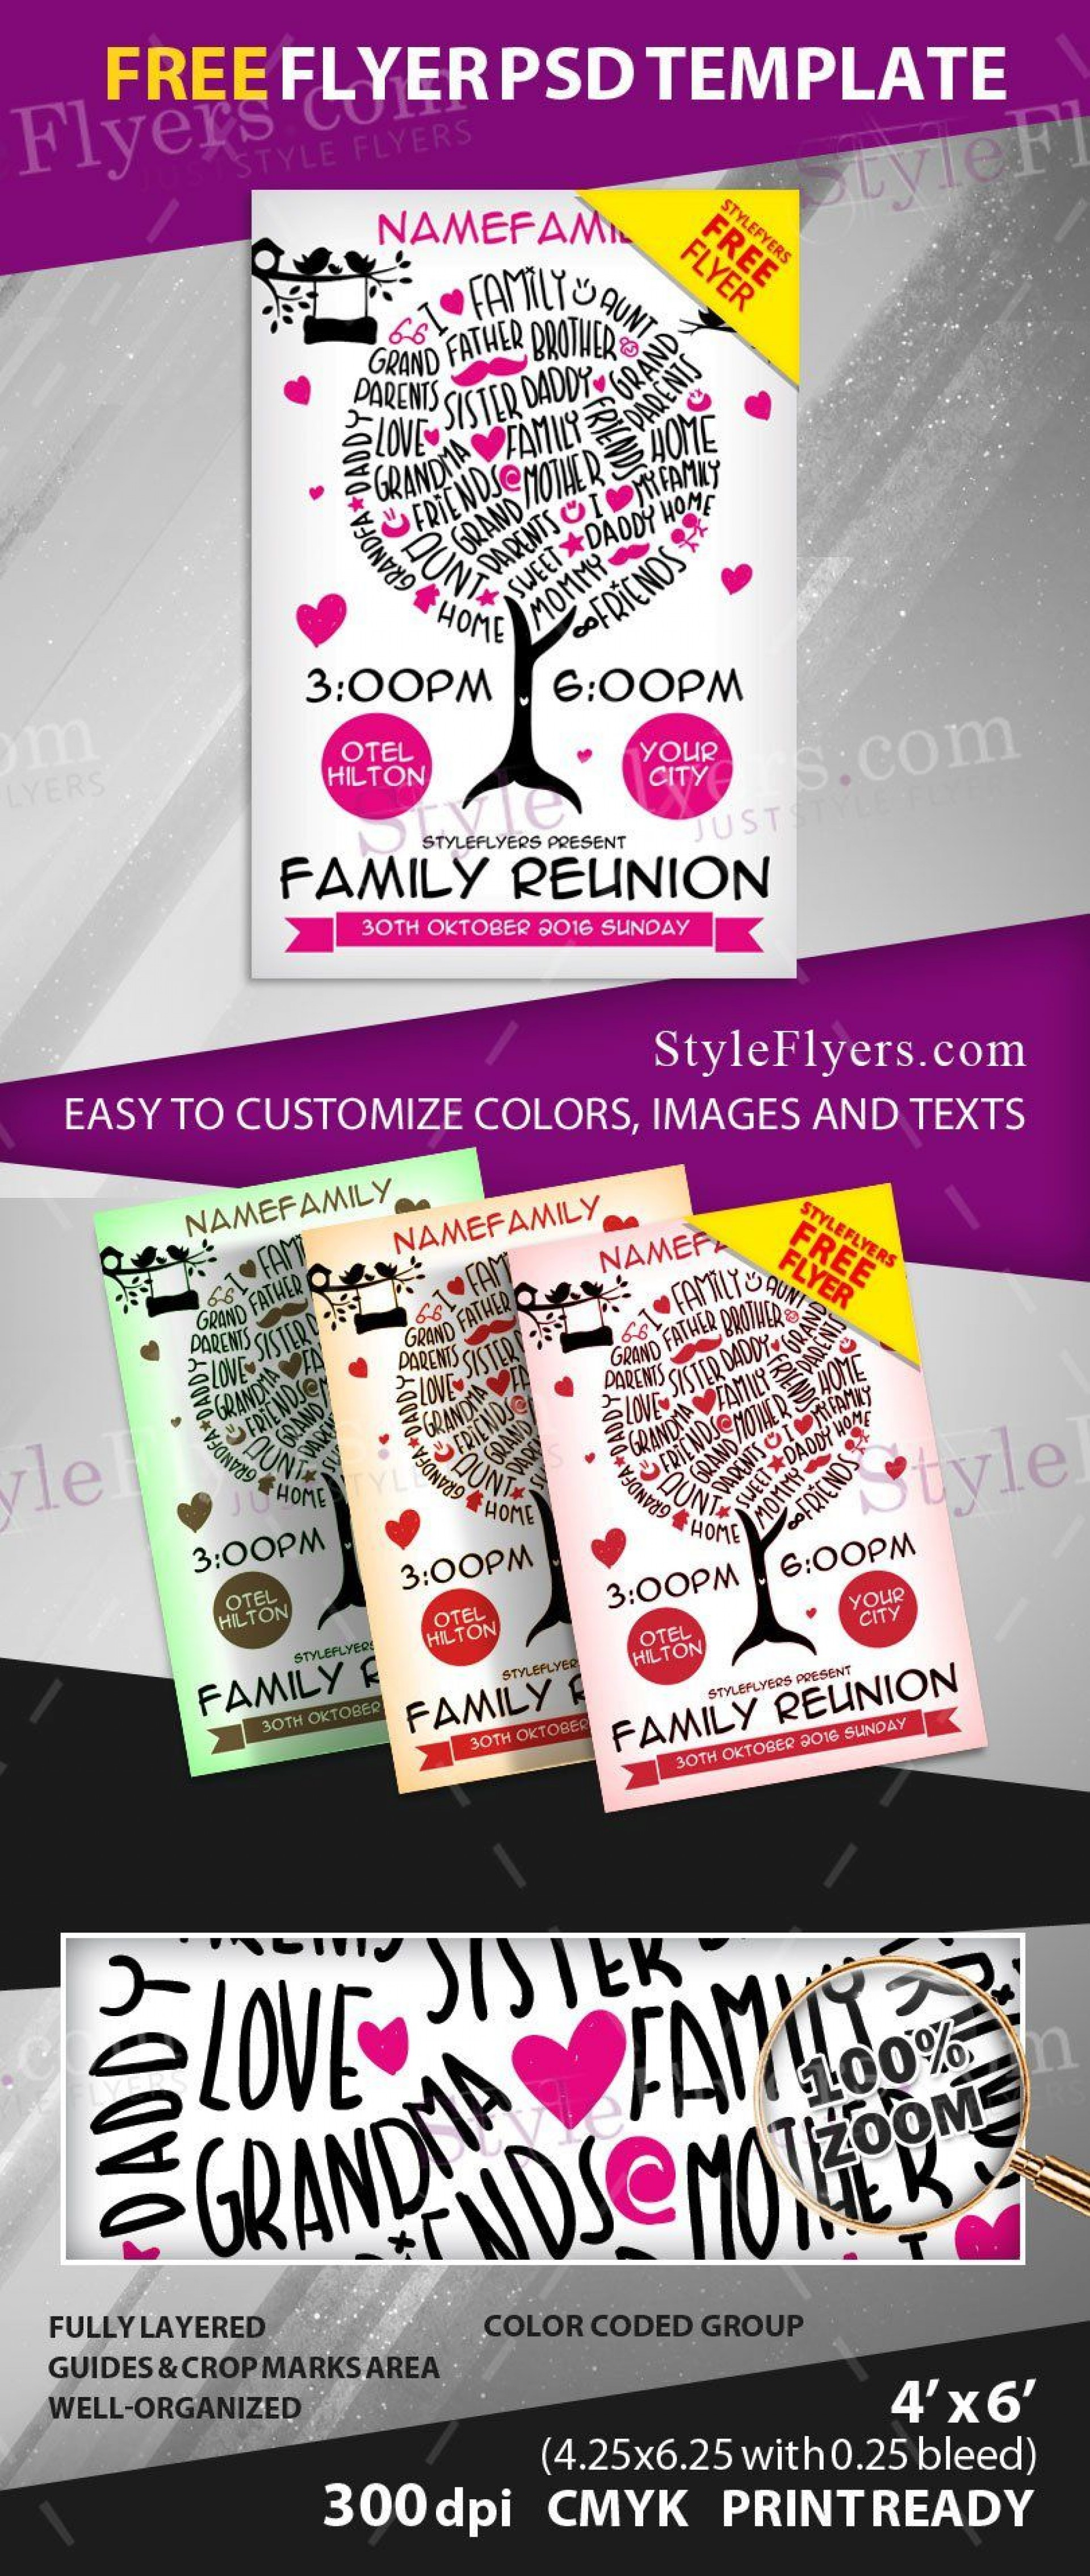 009 Unbelievable Family Reunion Flyer Template Free Concept  Downloadable Printable Invitation1920